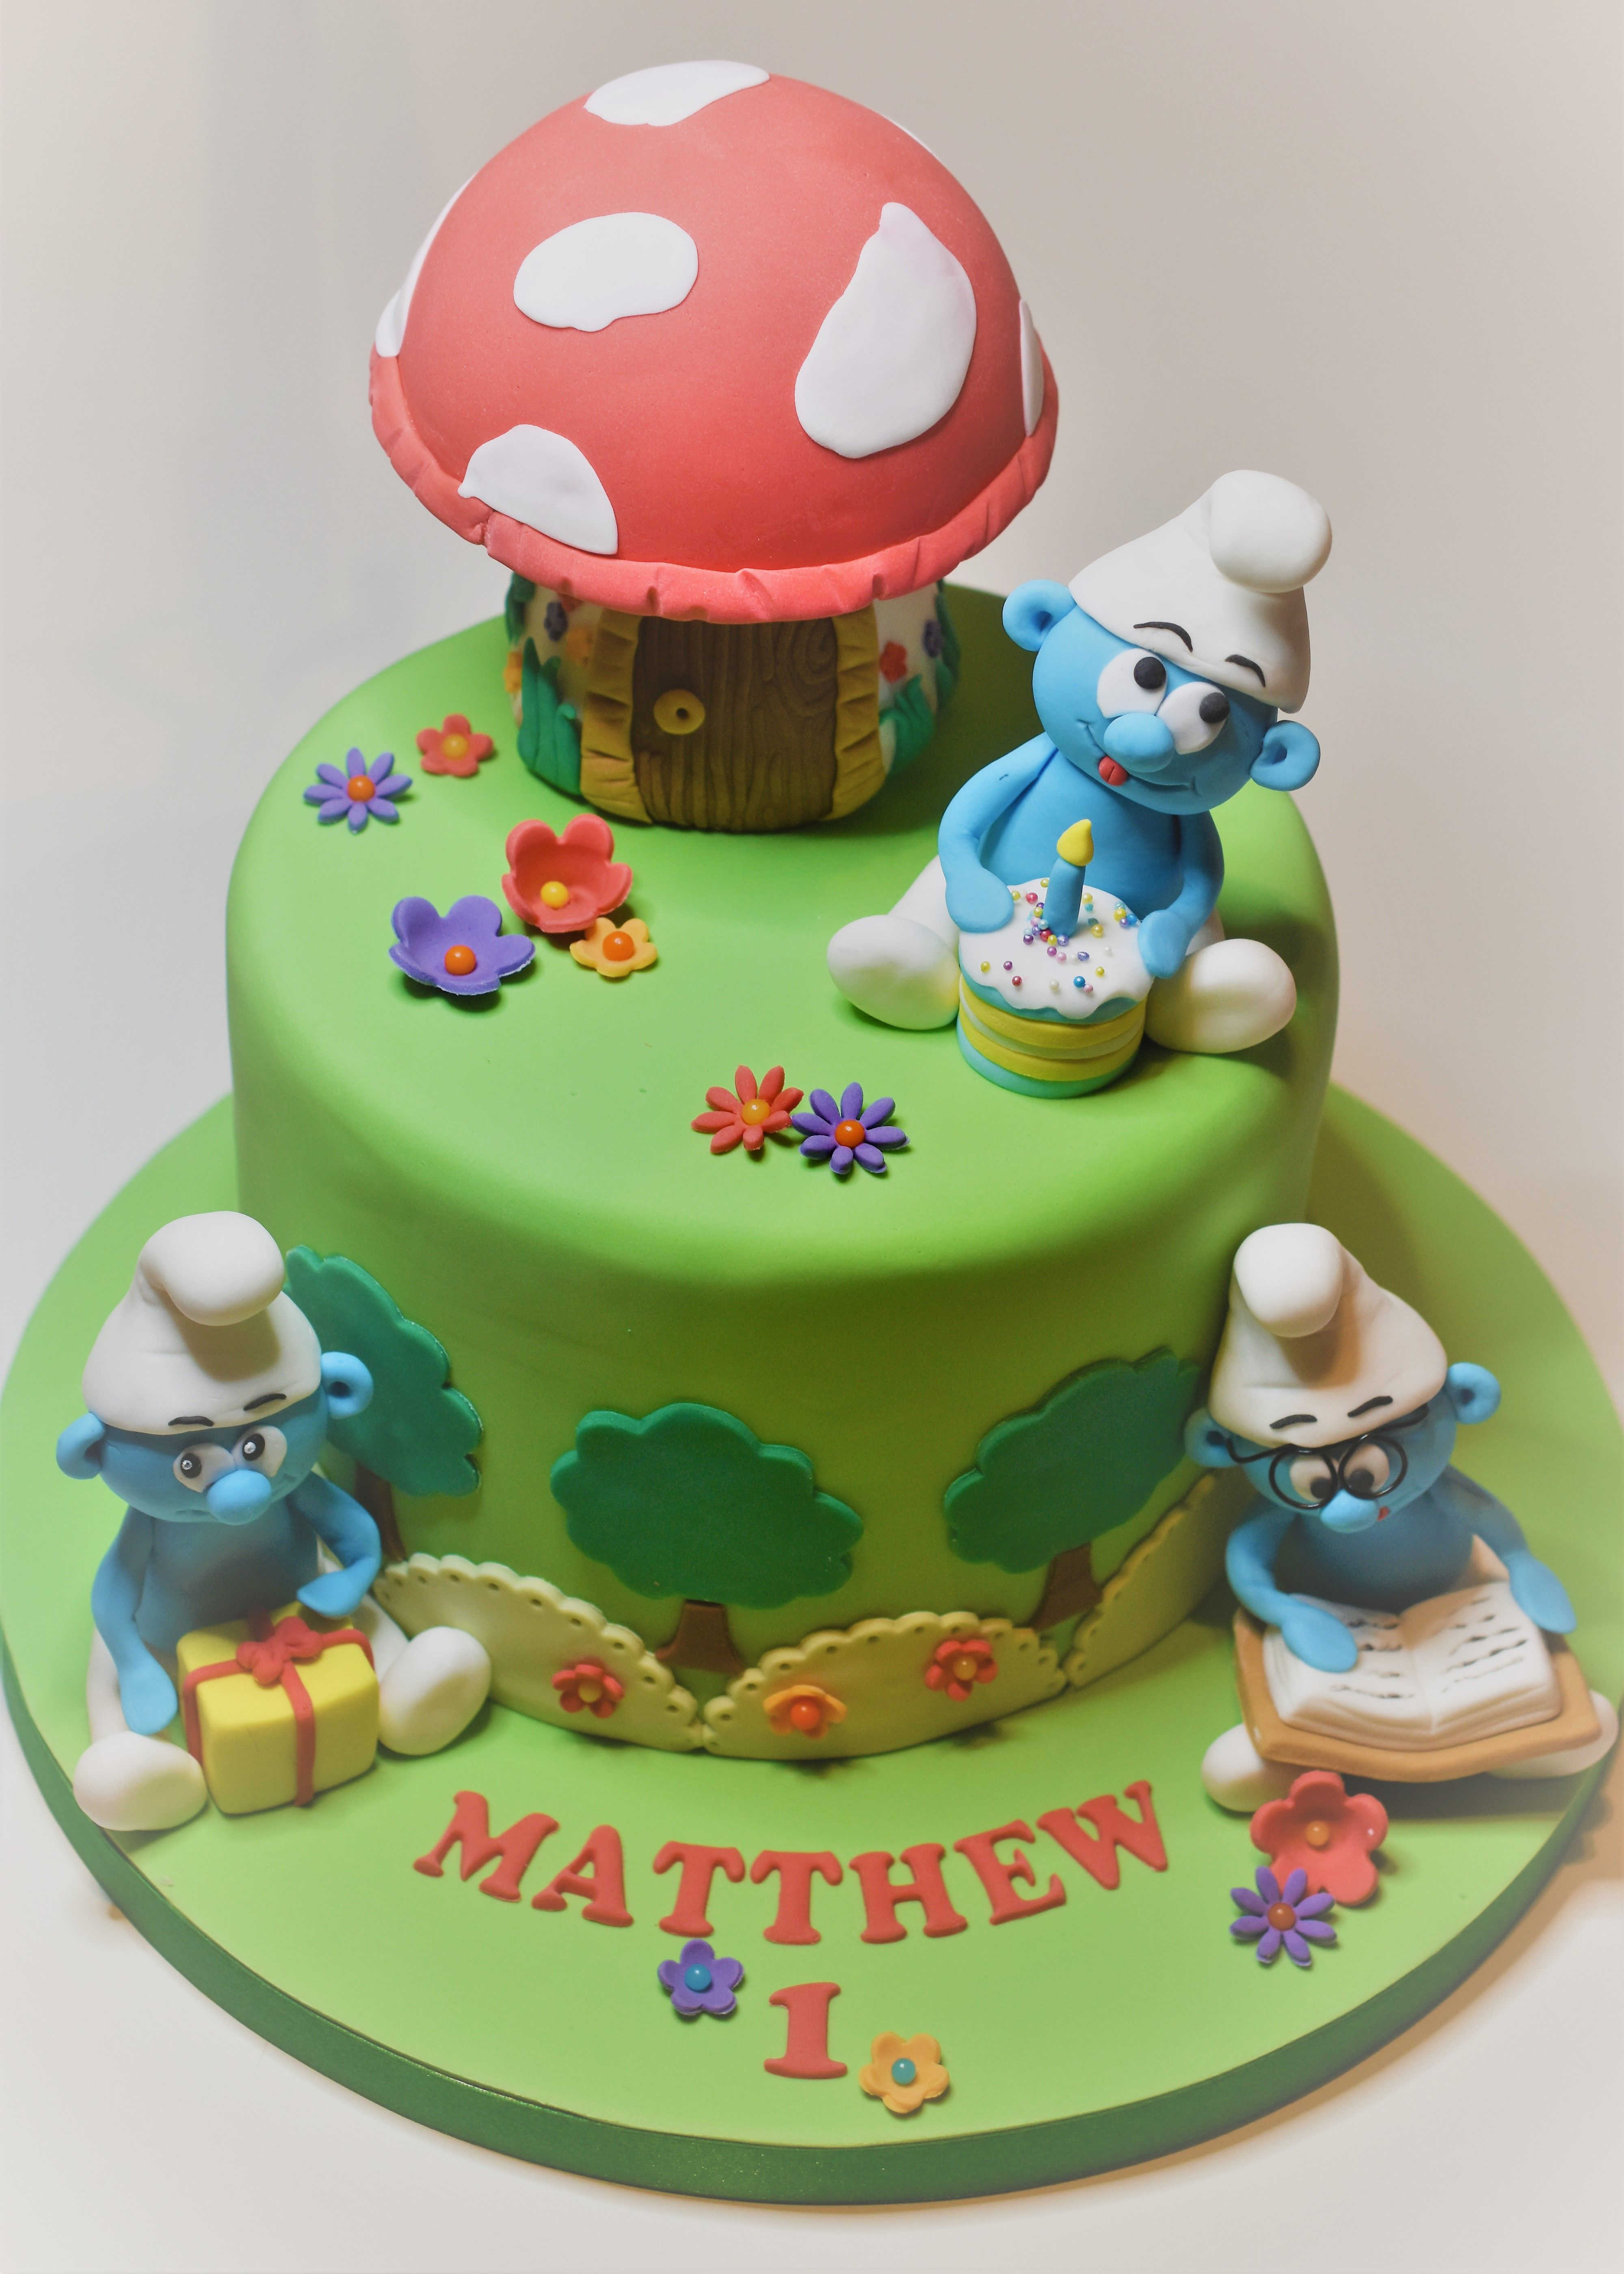 Cool Smurfs Birthday Cake Smurfs Cake Birthday Cake Birthday Cake Funny Birthday Cards Online Overcheapnameinfo